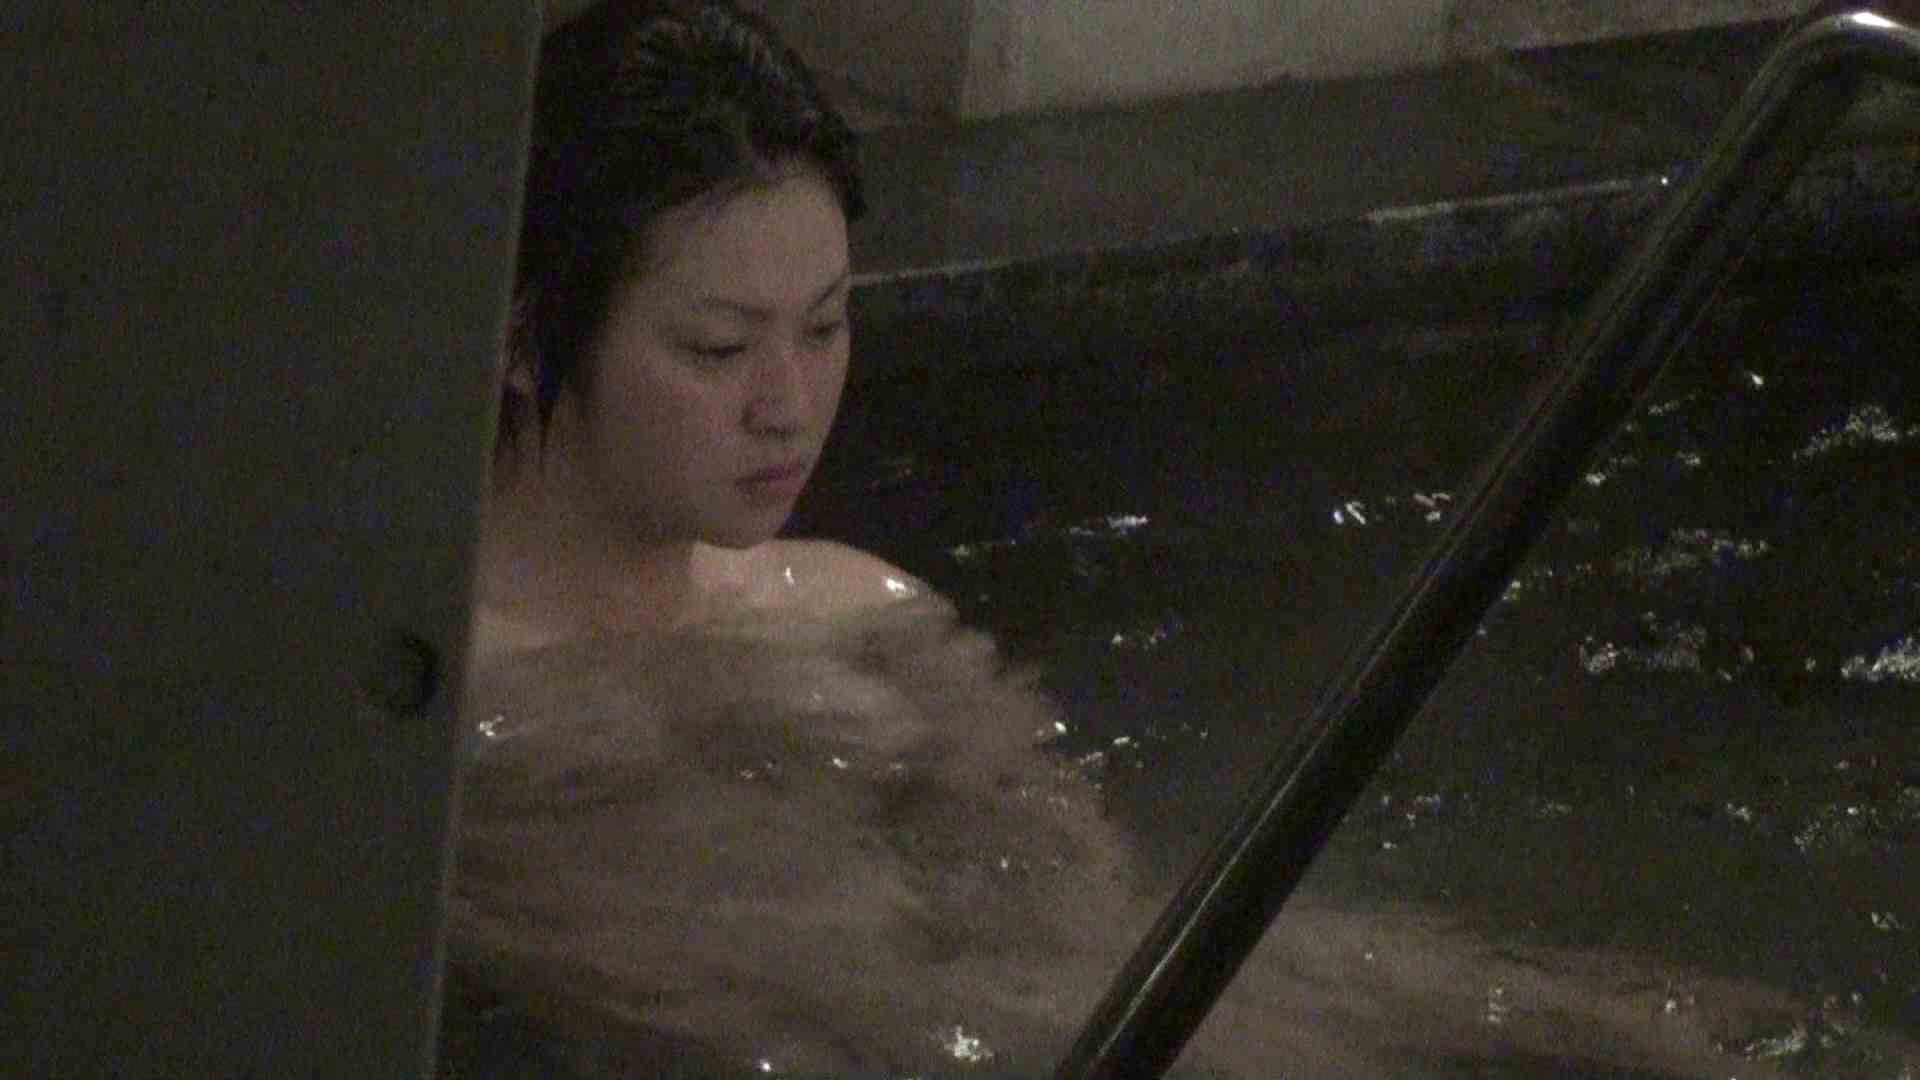 Aquaな露天風呂Vol.338 露天風呂編  82PIX 80